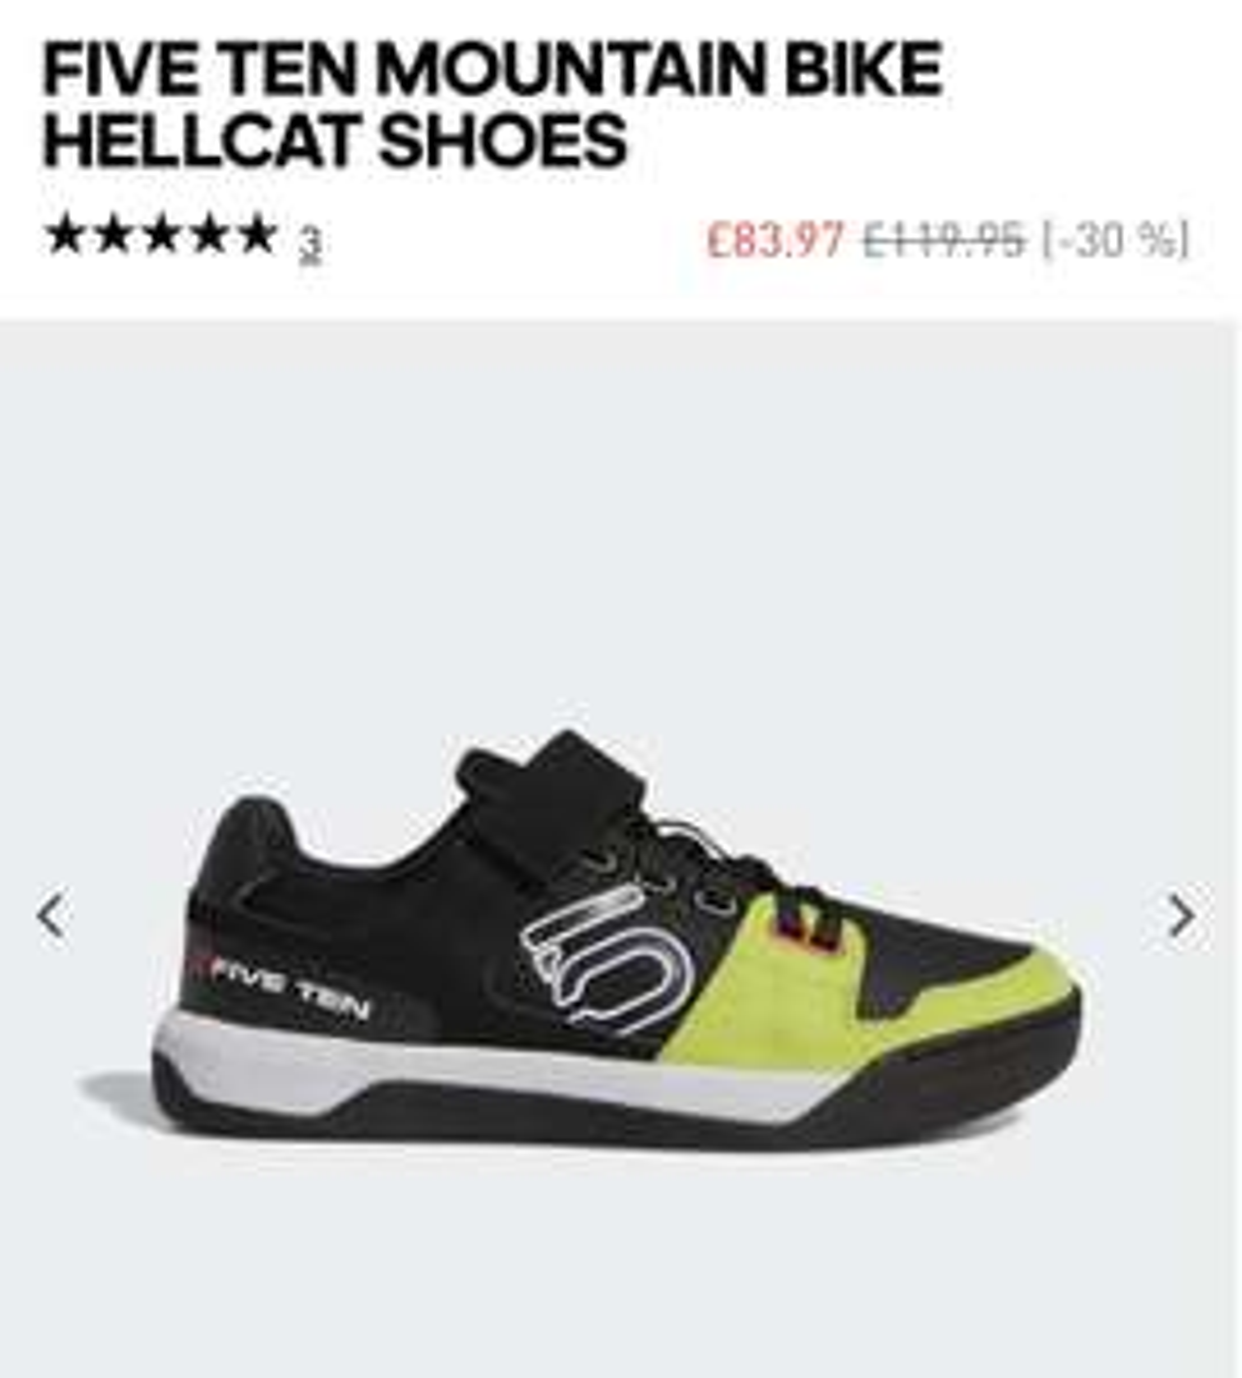 Five ten hellcat SPD mountain bike MTB Shoe £63.98 @ adidas